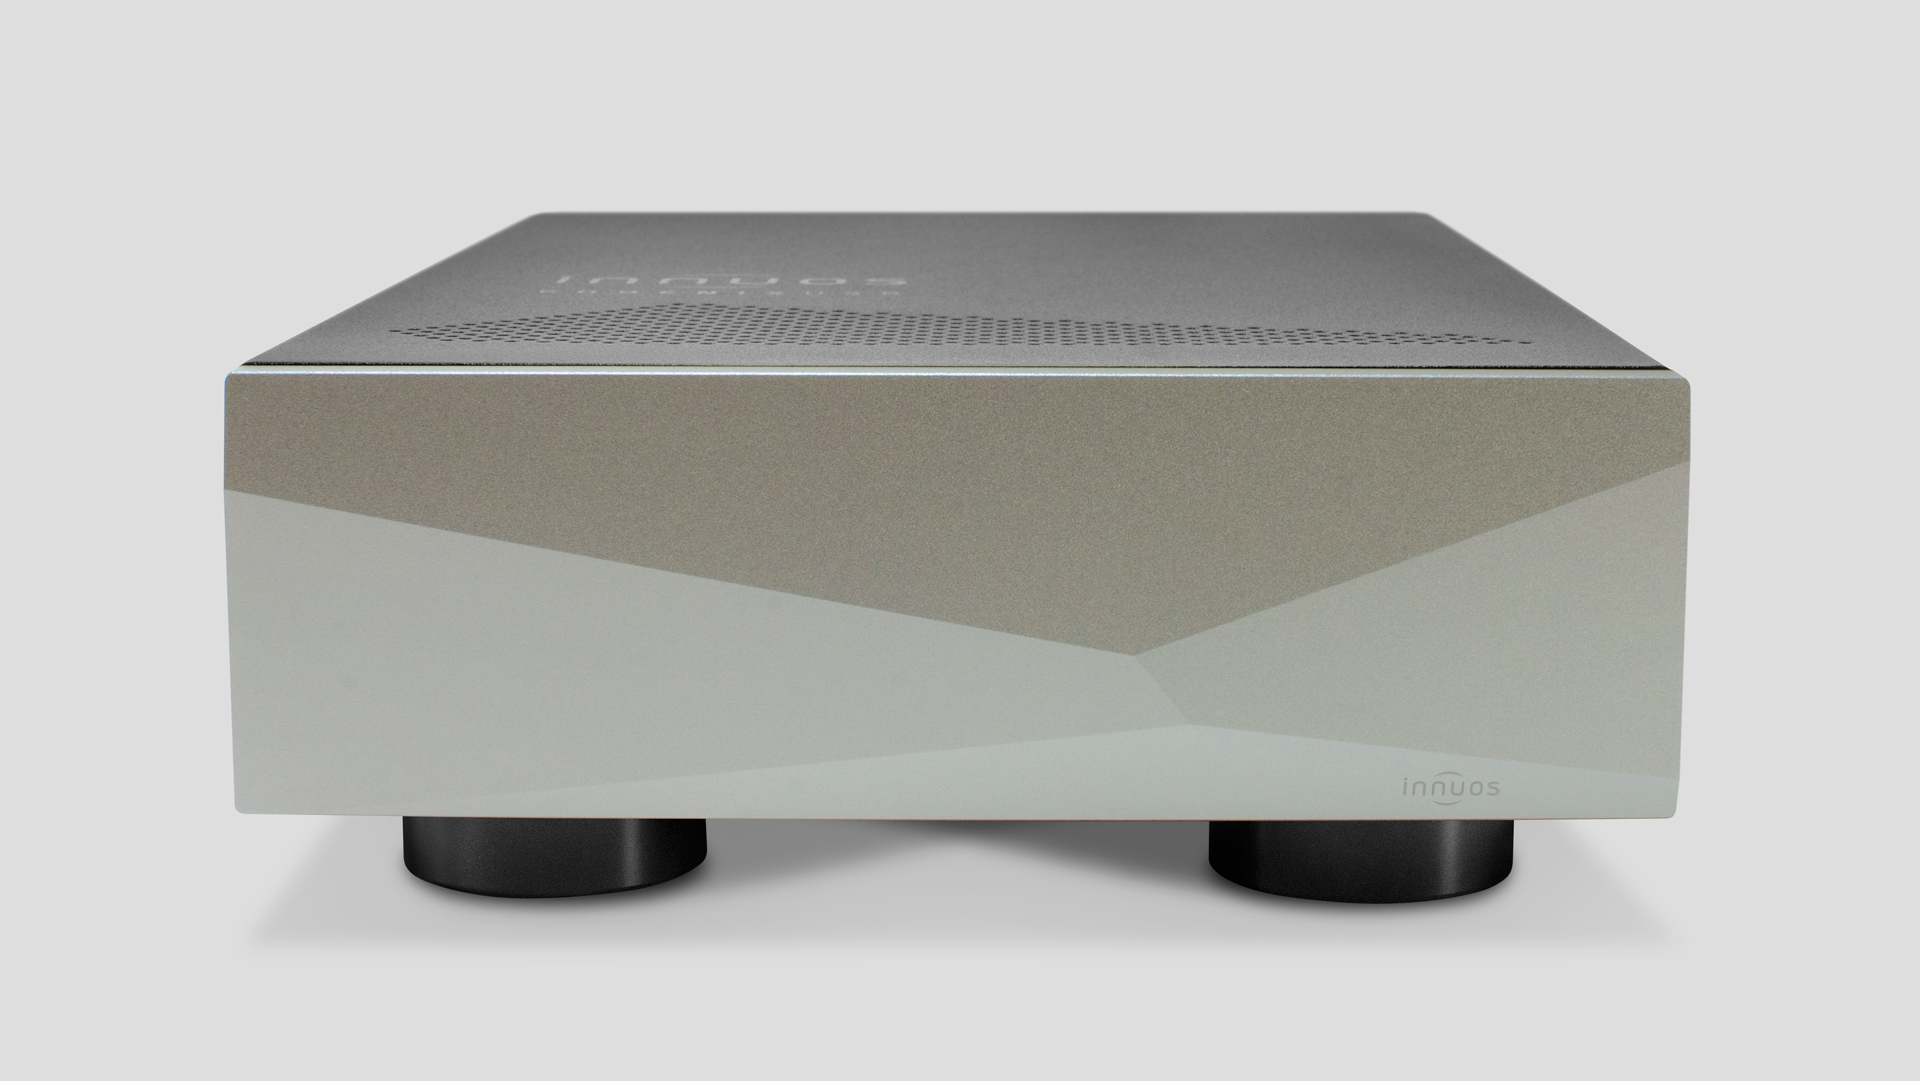 Innuos Superb PhoenixNet Re-clocker. Now at True Audiophile.